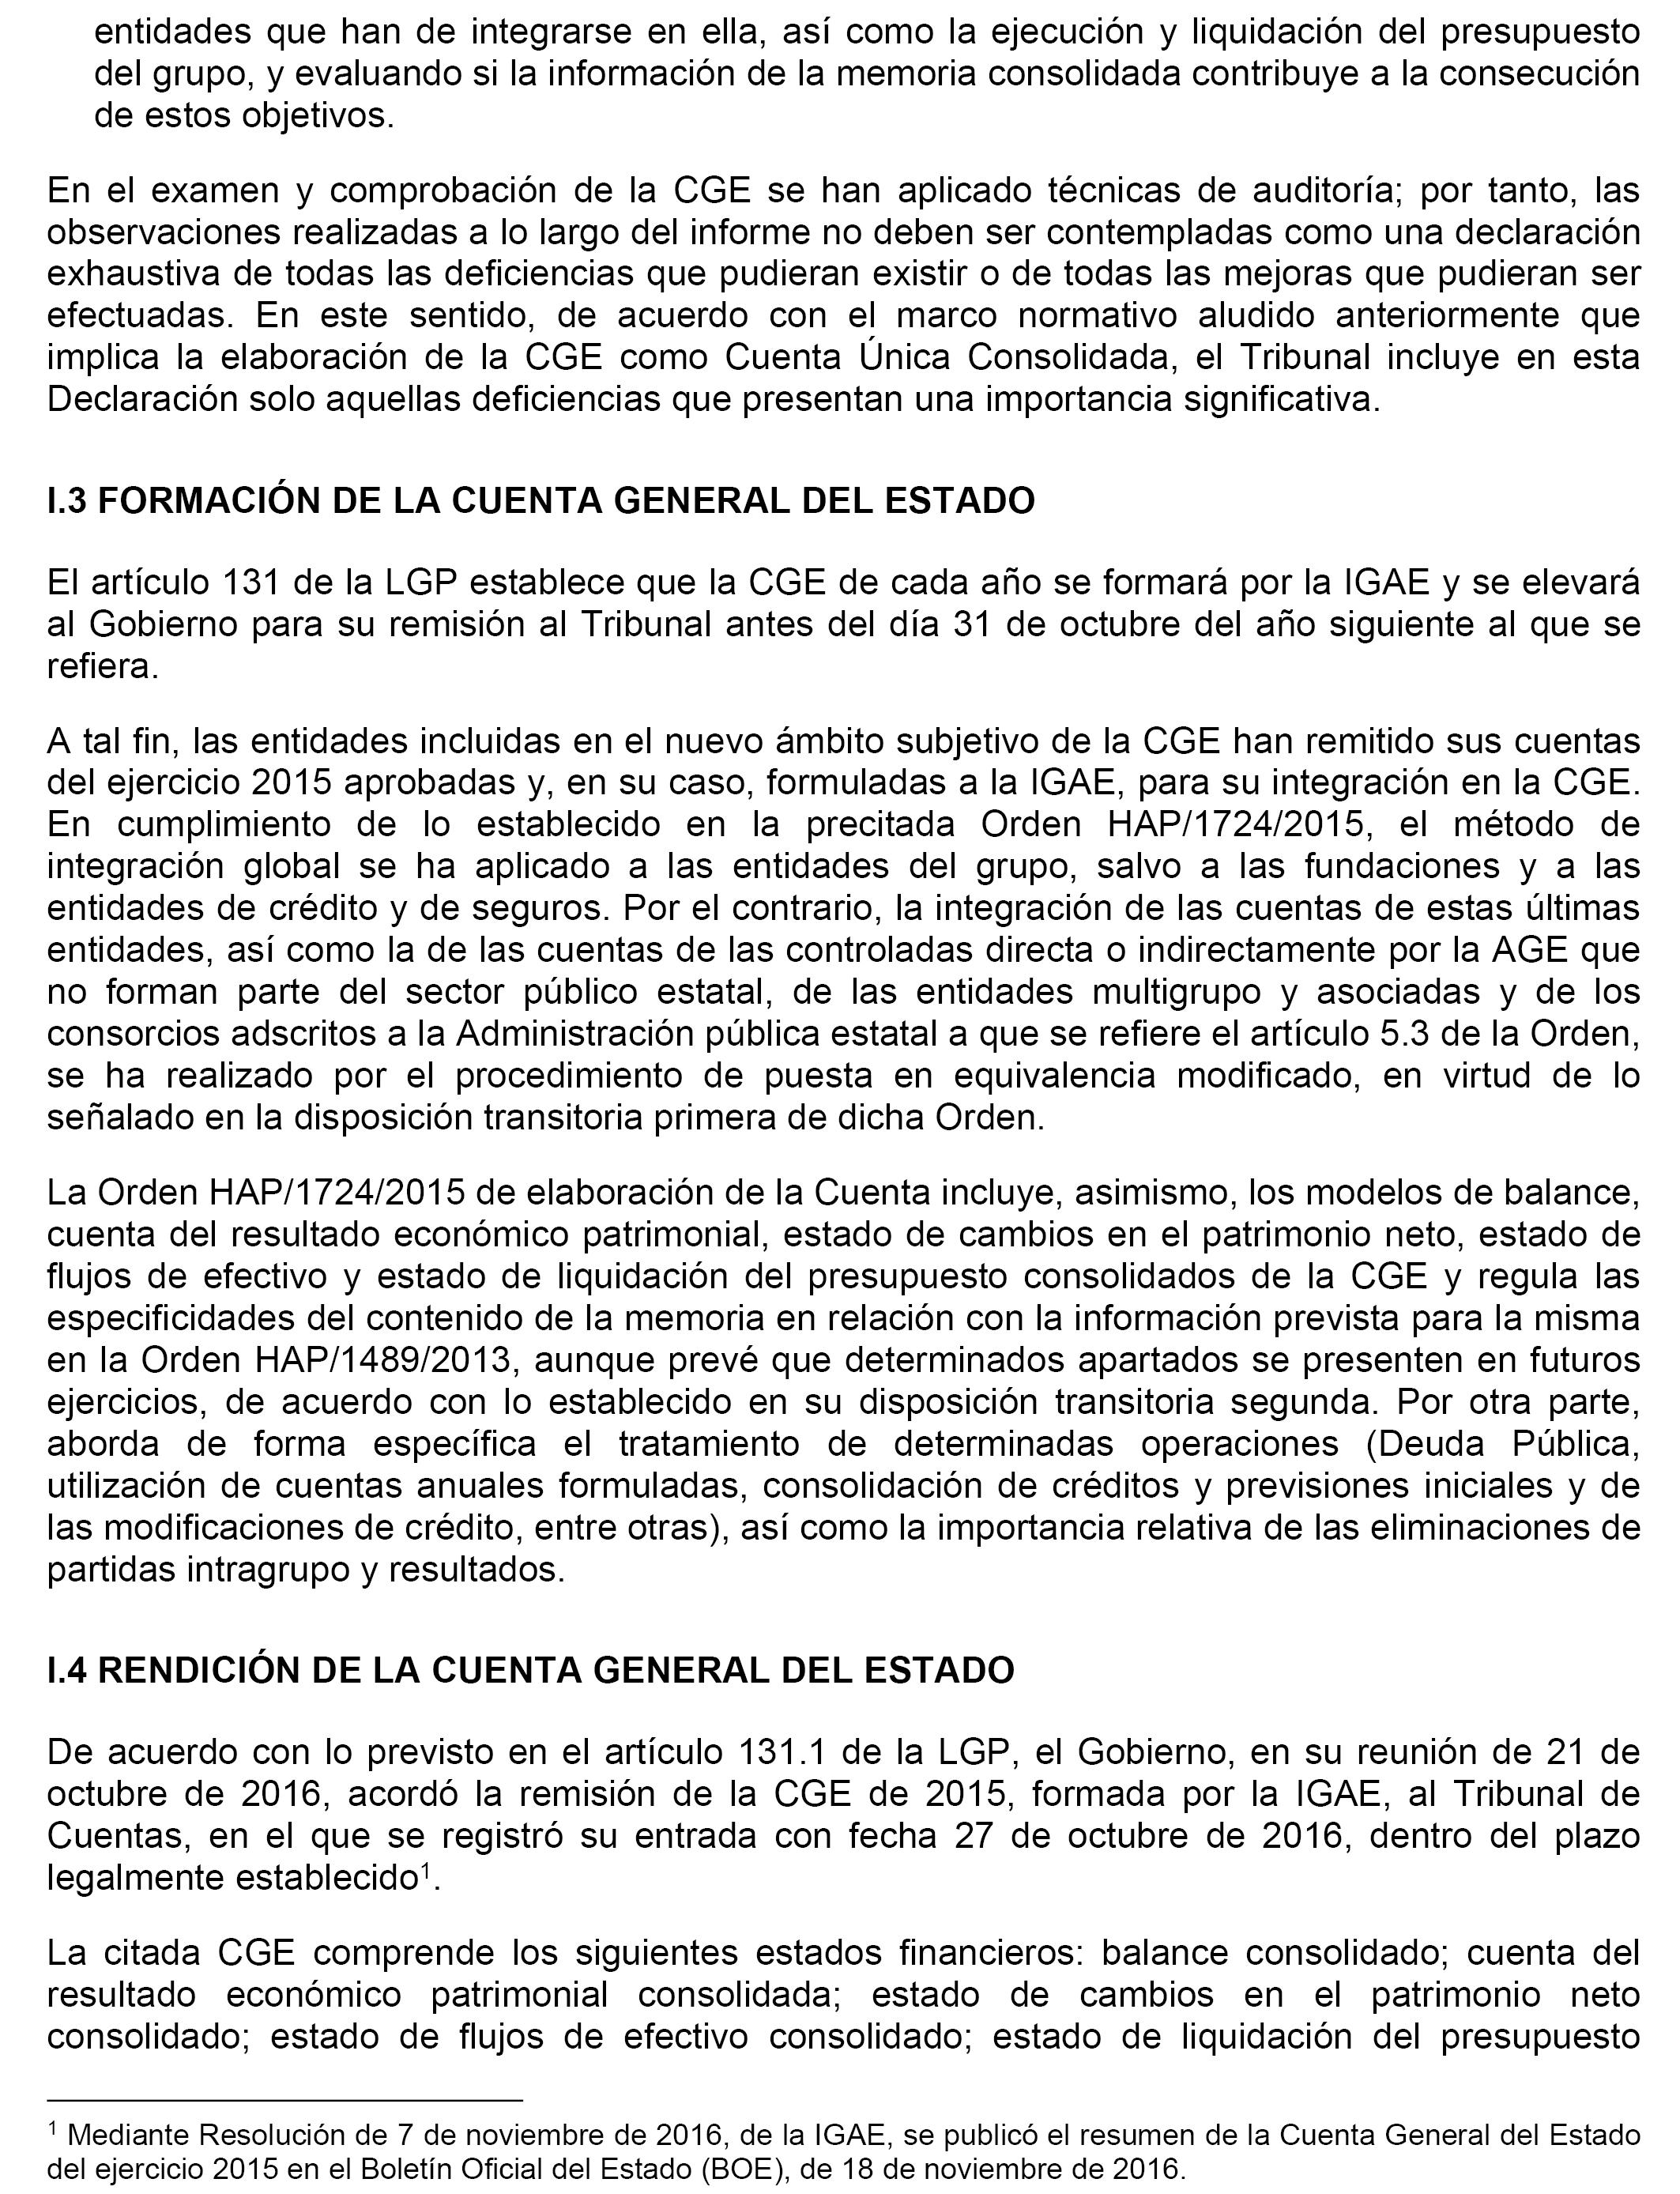 BOE.es - Documento BOE-A-2018-137